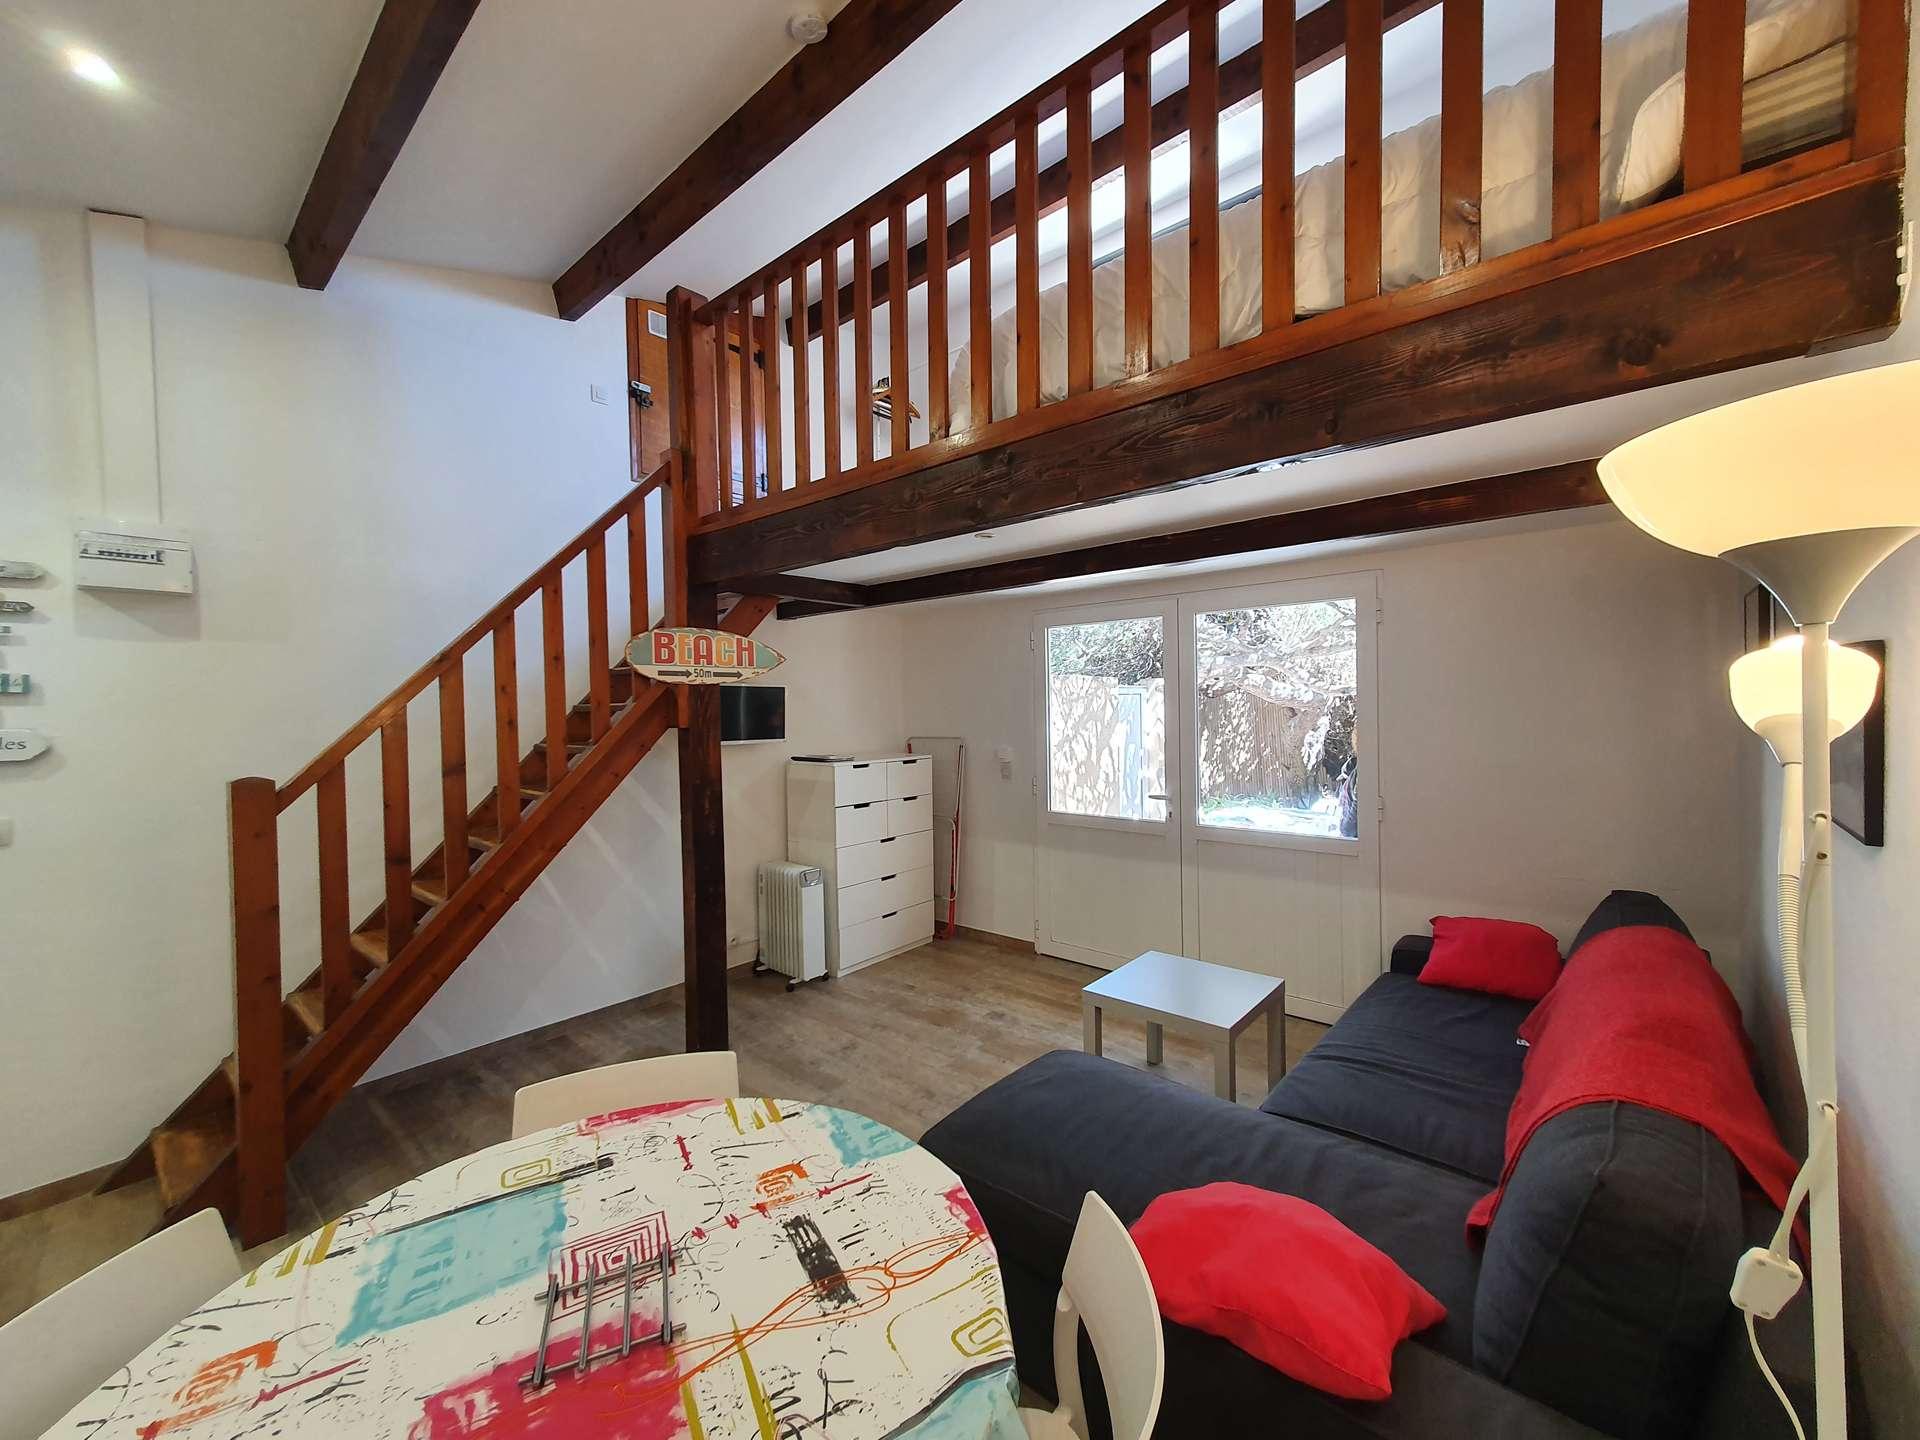 Studio + Mezzanine Hyères (La Capte)